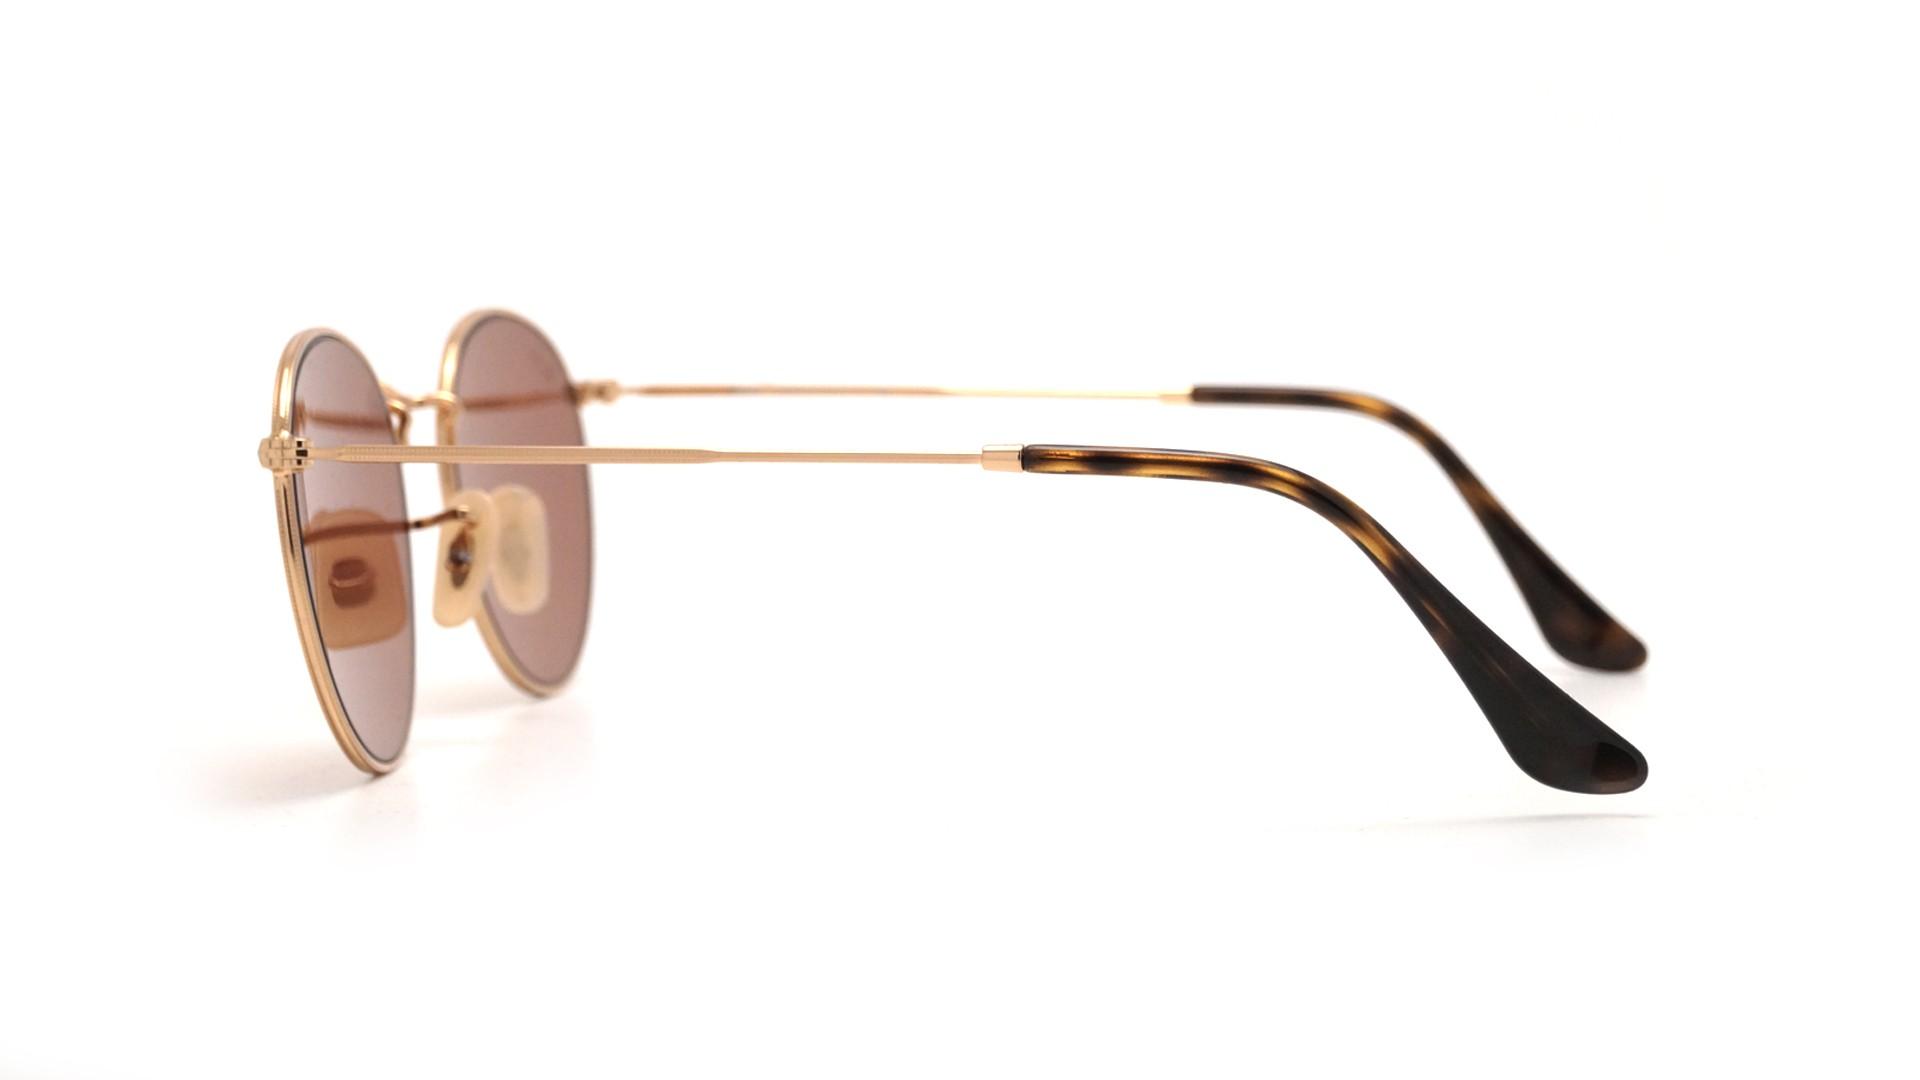 828c28fc635 Ray-Ban Round Metal Flat Lenses Or RB3447N 001 Z2 50-21